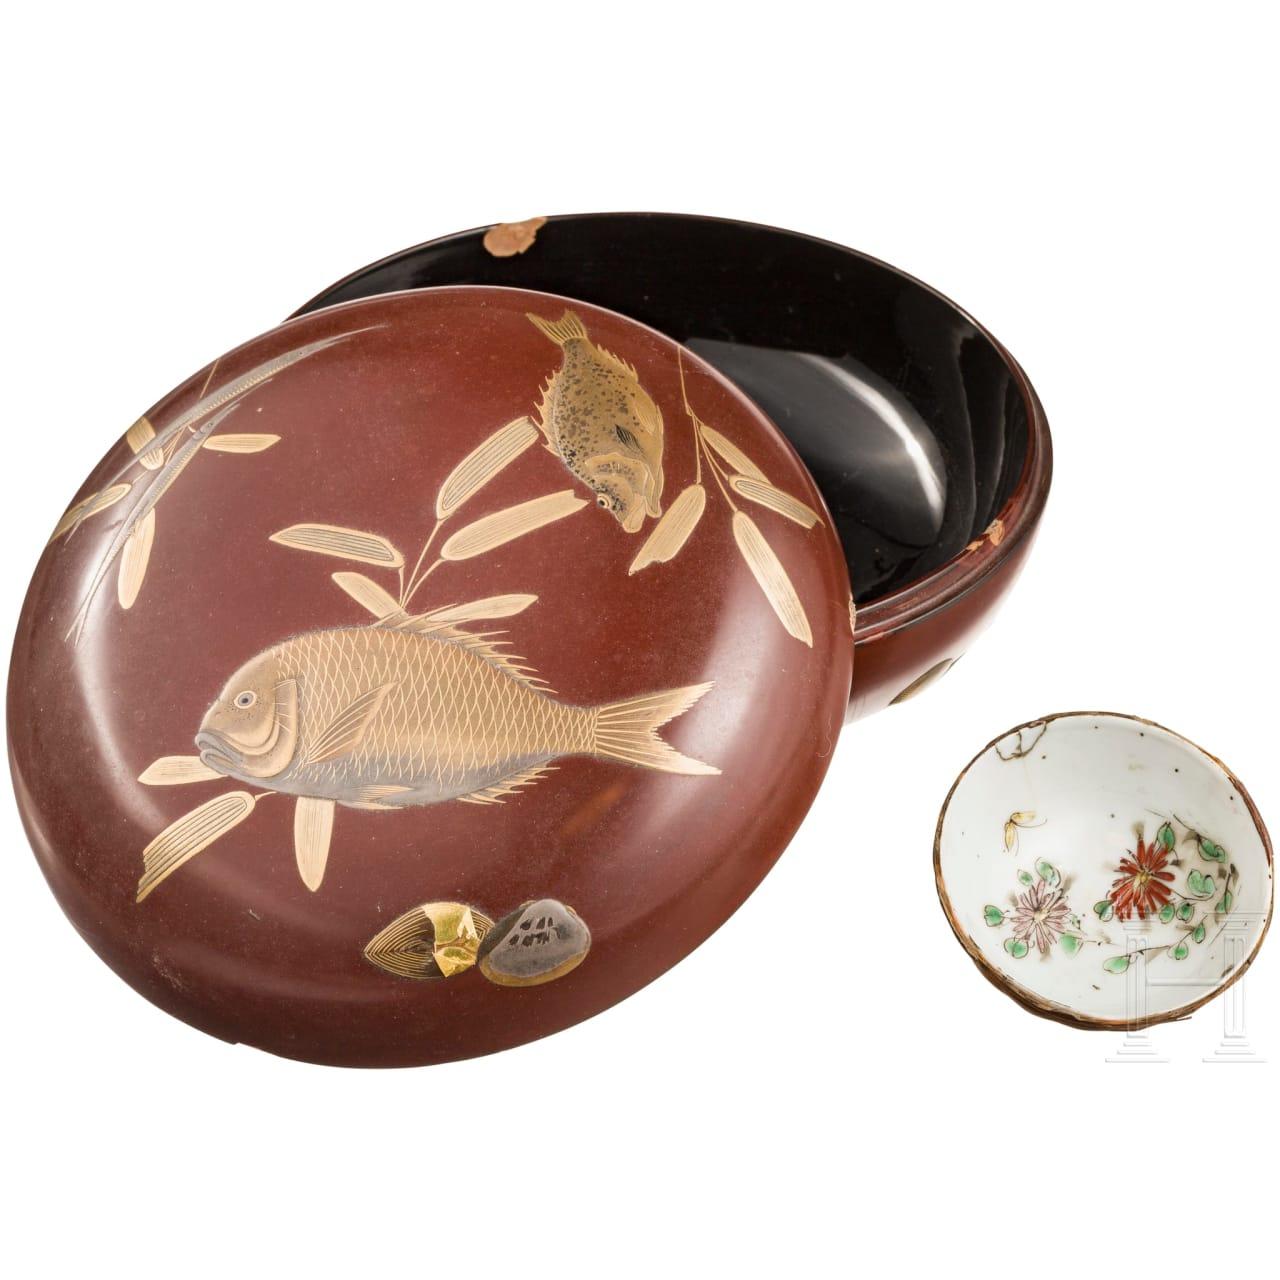 Runde Lackdose und Porzellan-Teeschale, Japan, Meiji-Periode bzw. China